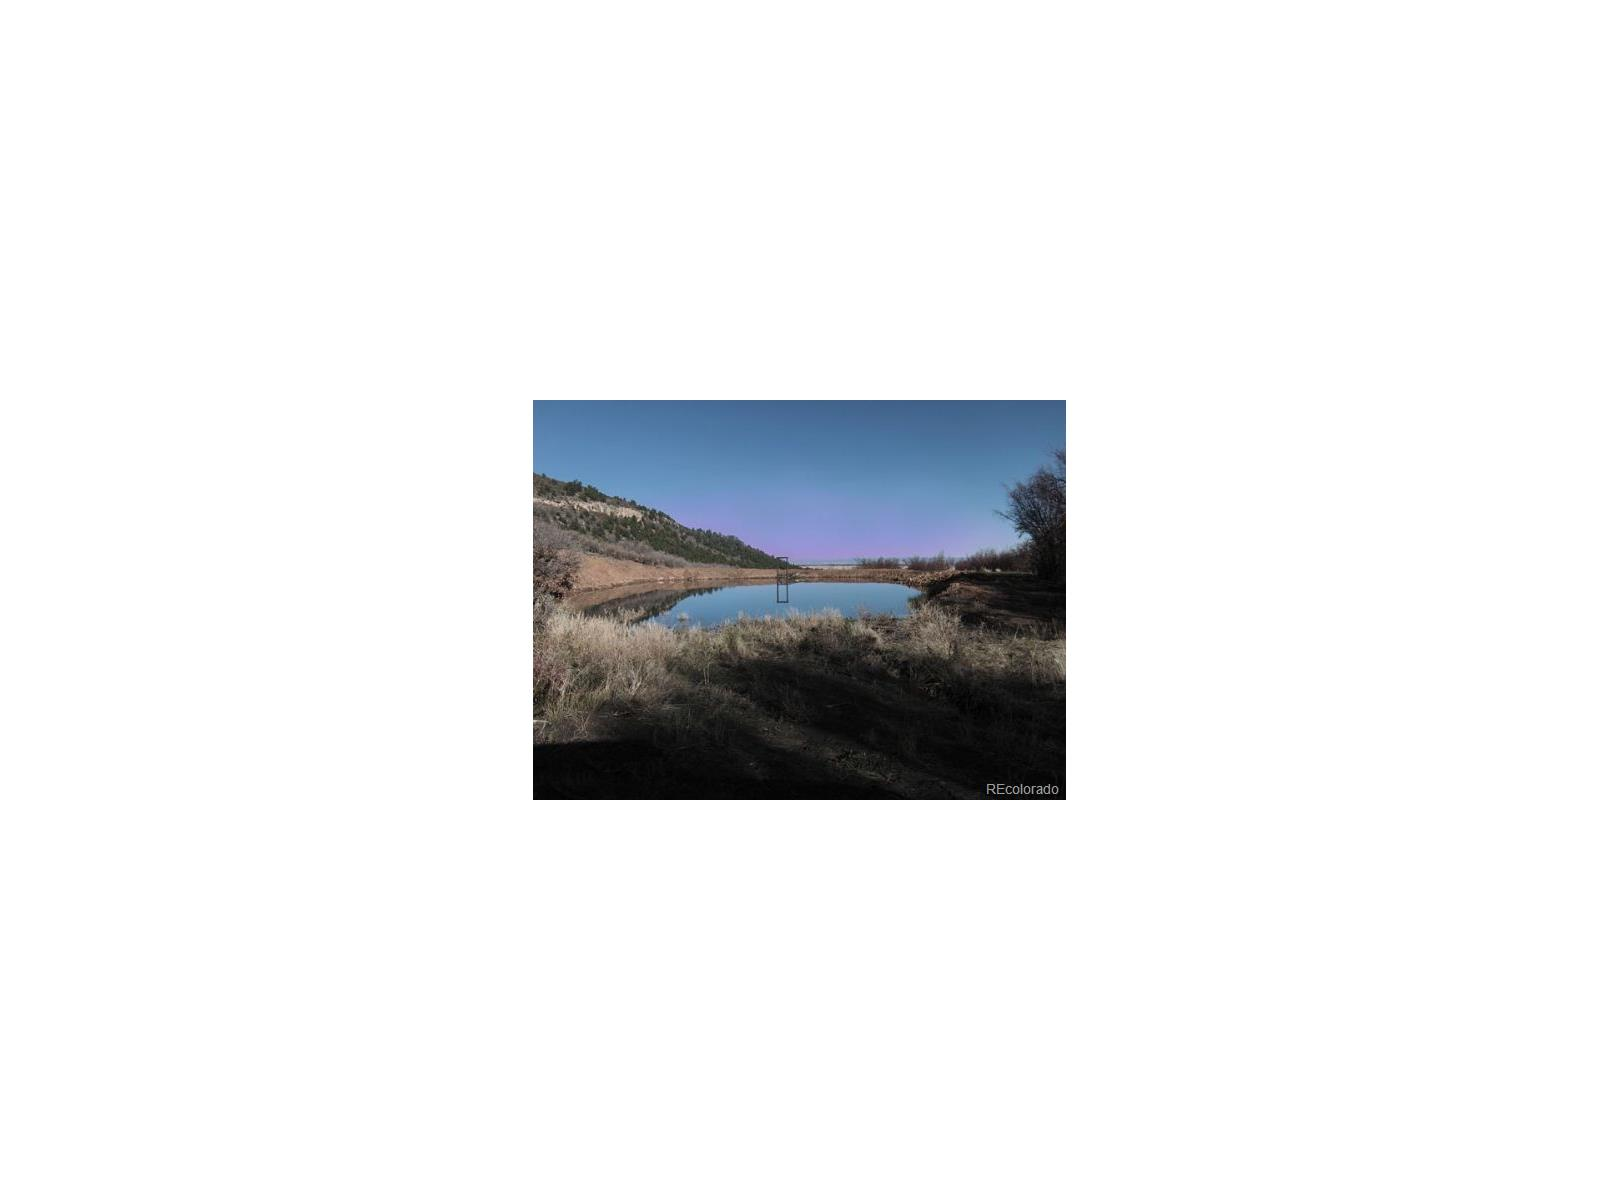 5491 S 7 1/2 Road, Glade Park, CO 81523 - Glade Park, CO real estate listing